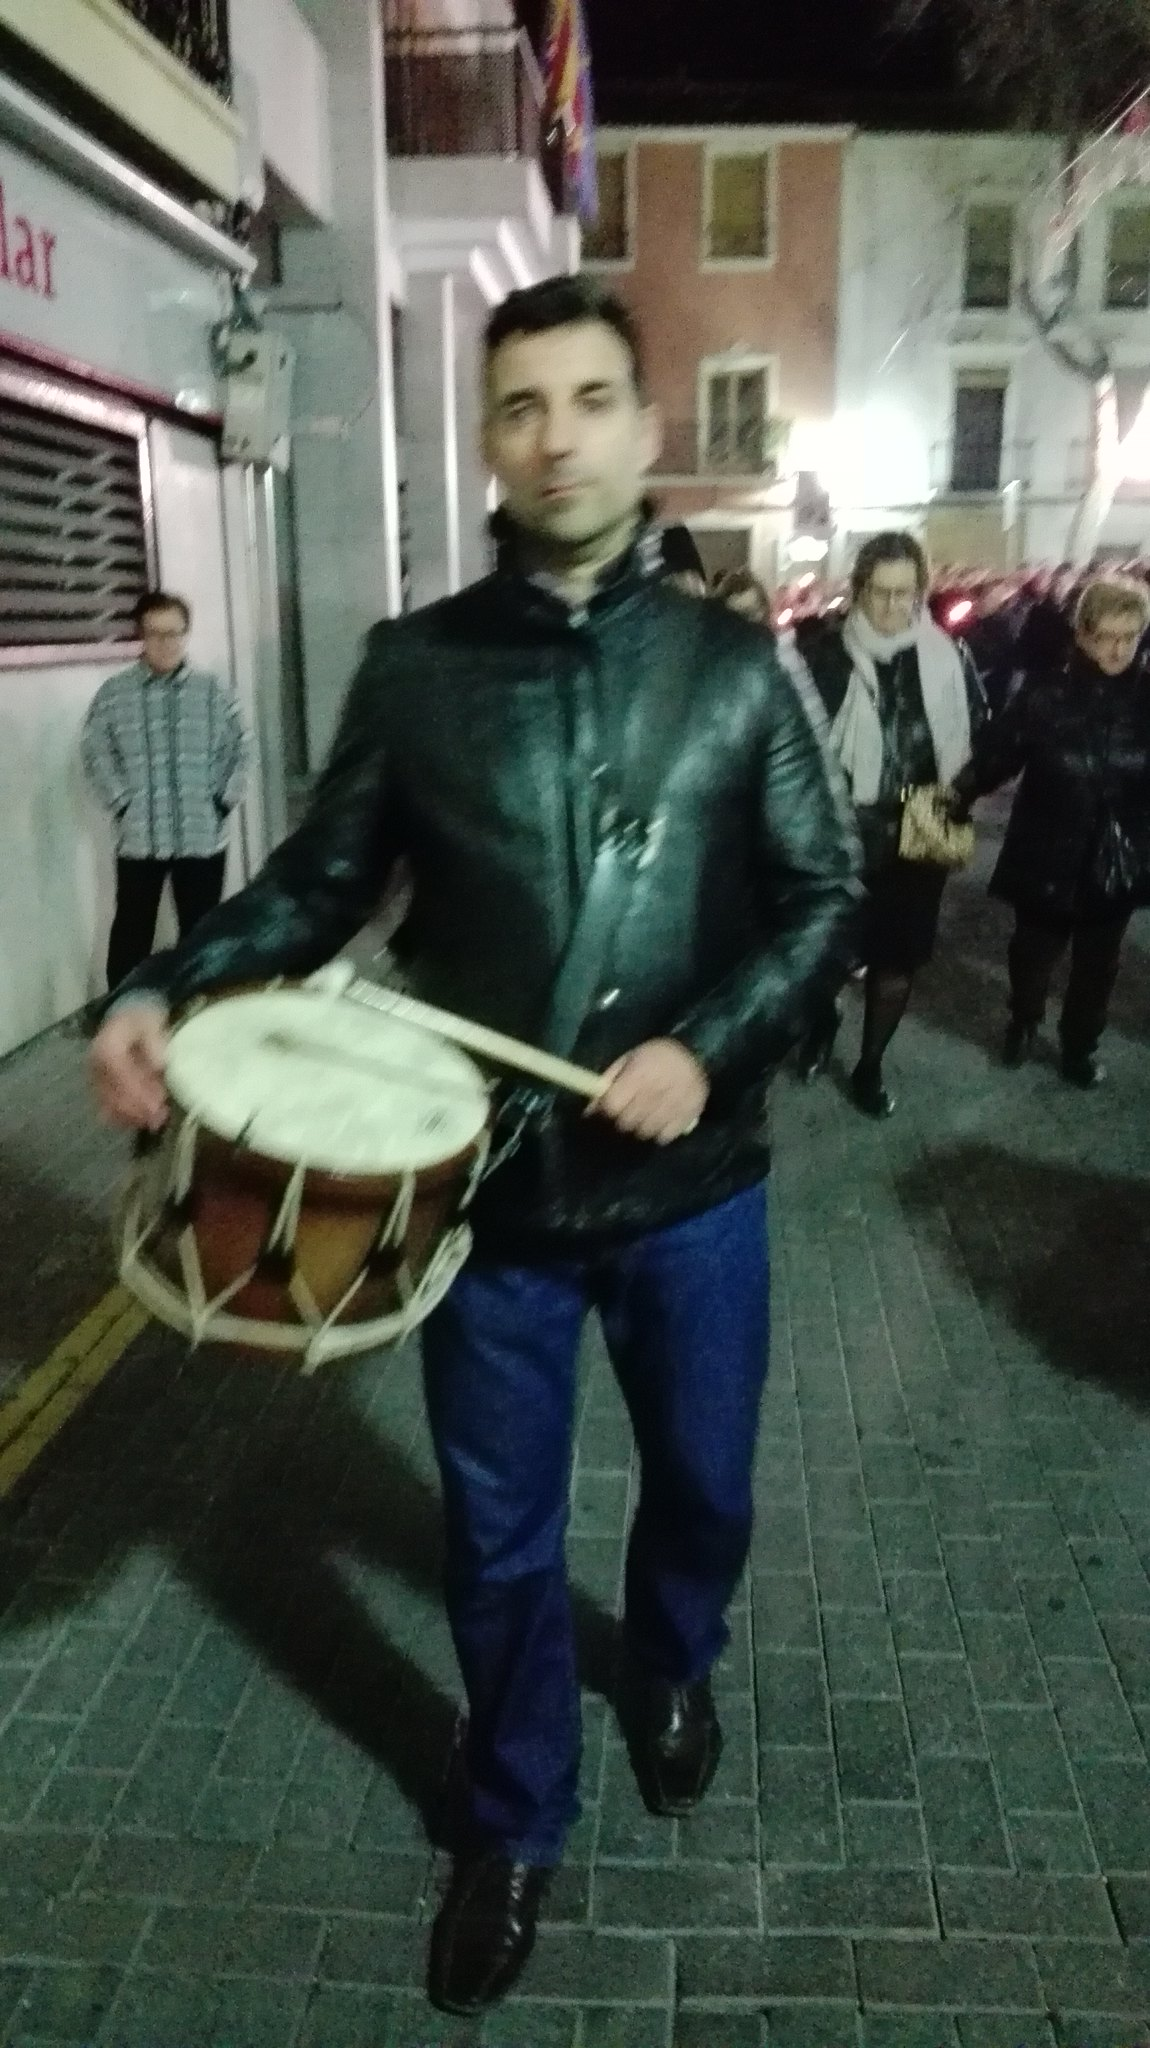 (2016-03-18) - VII Vía Crucis nocturno - Javier Romero Ripoll (076)